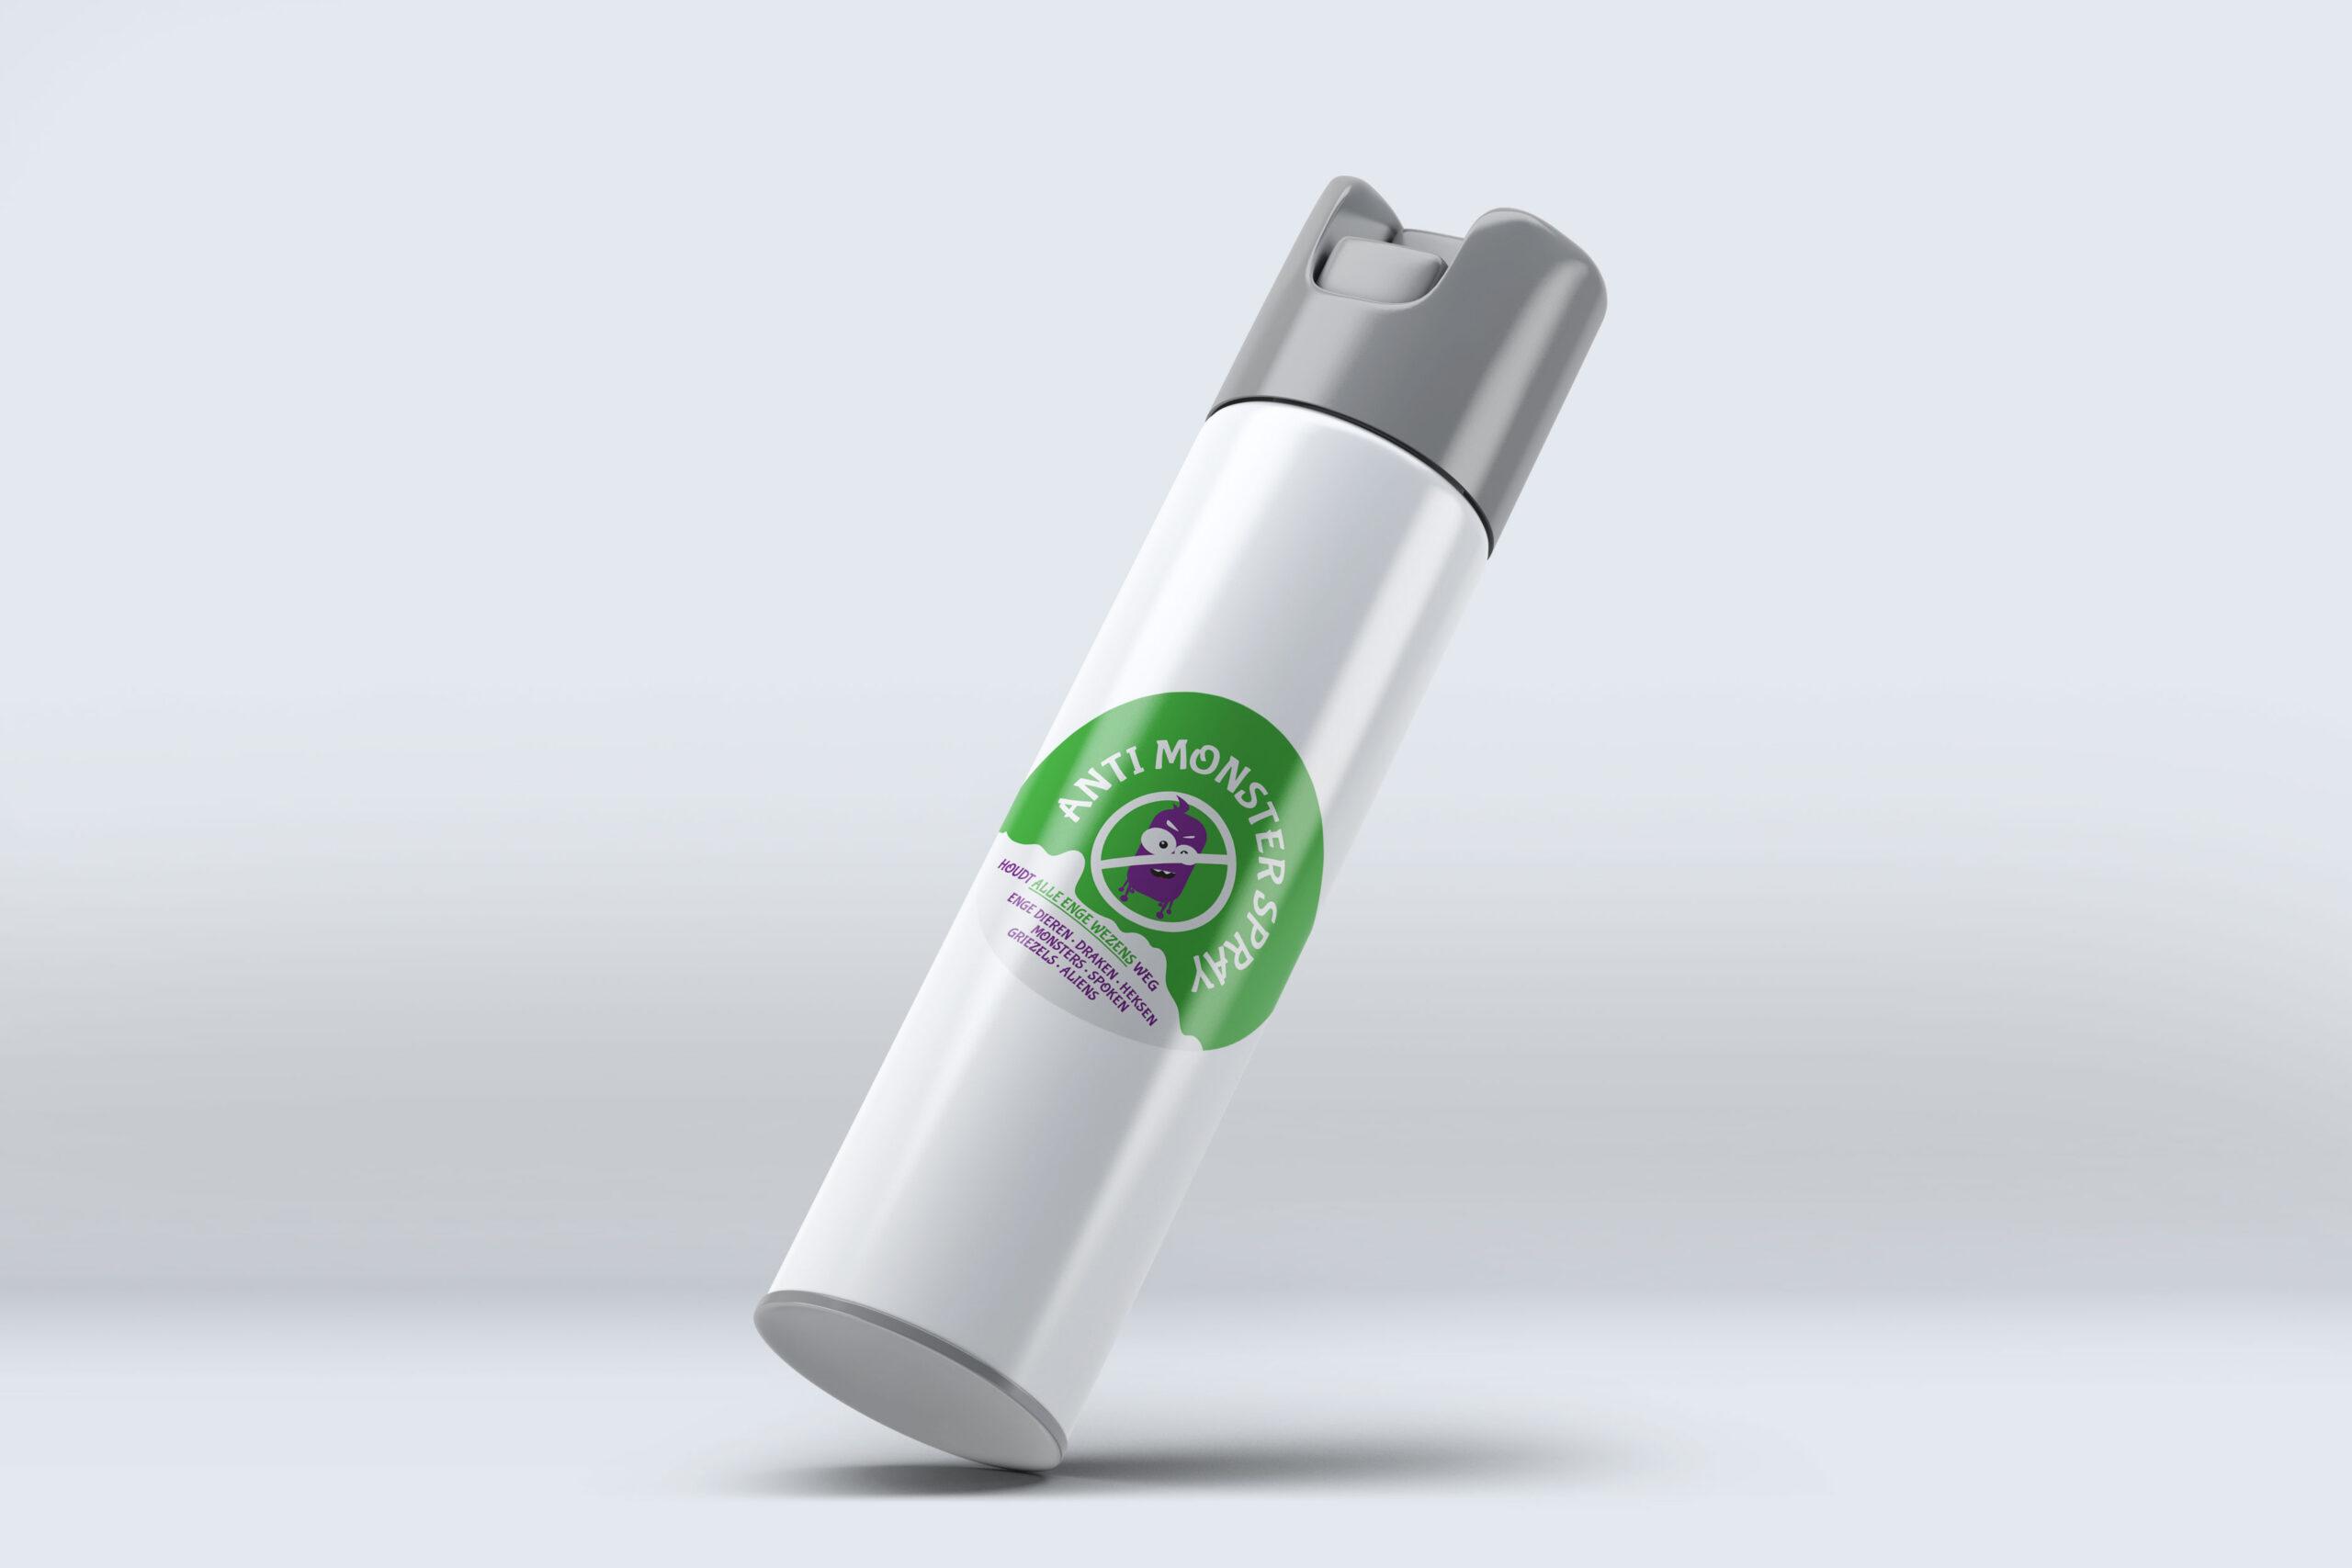 Anti monster spray label op spuitbus